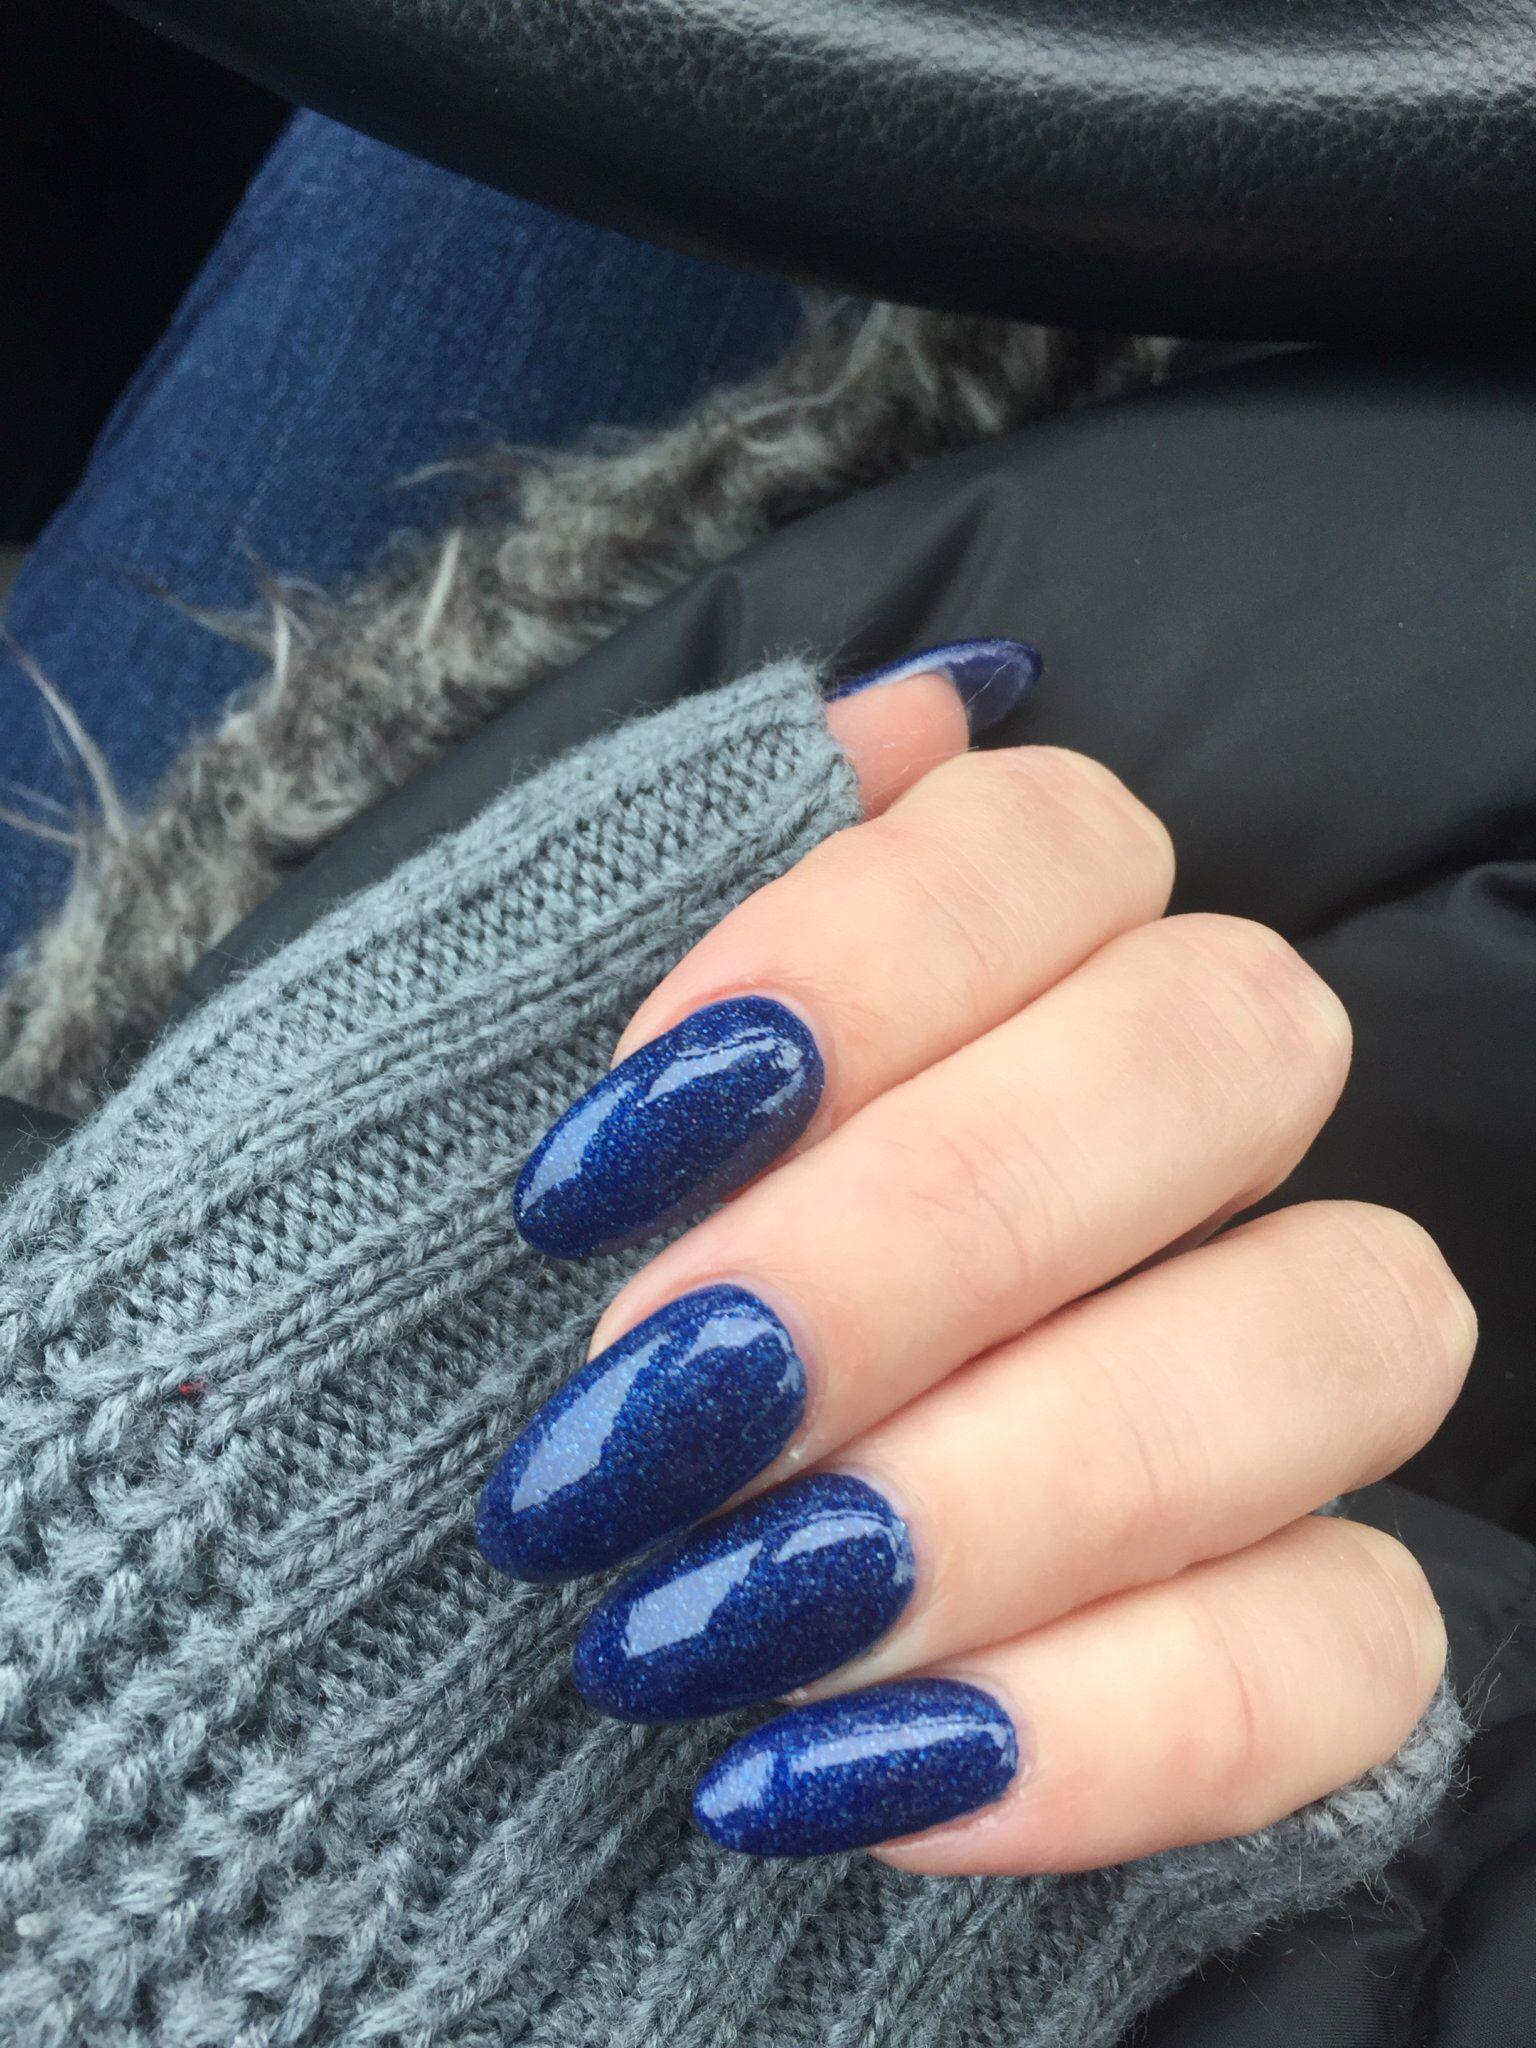 Almond Shaped Acrylic Long Nails Dark Blue Sparkly Nail Polish Got This Done December Blue Sparkly Nail Polish Acrylic Nails Almond Shape Sparkly Nail Polish